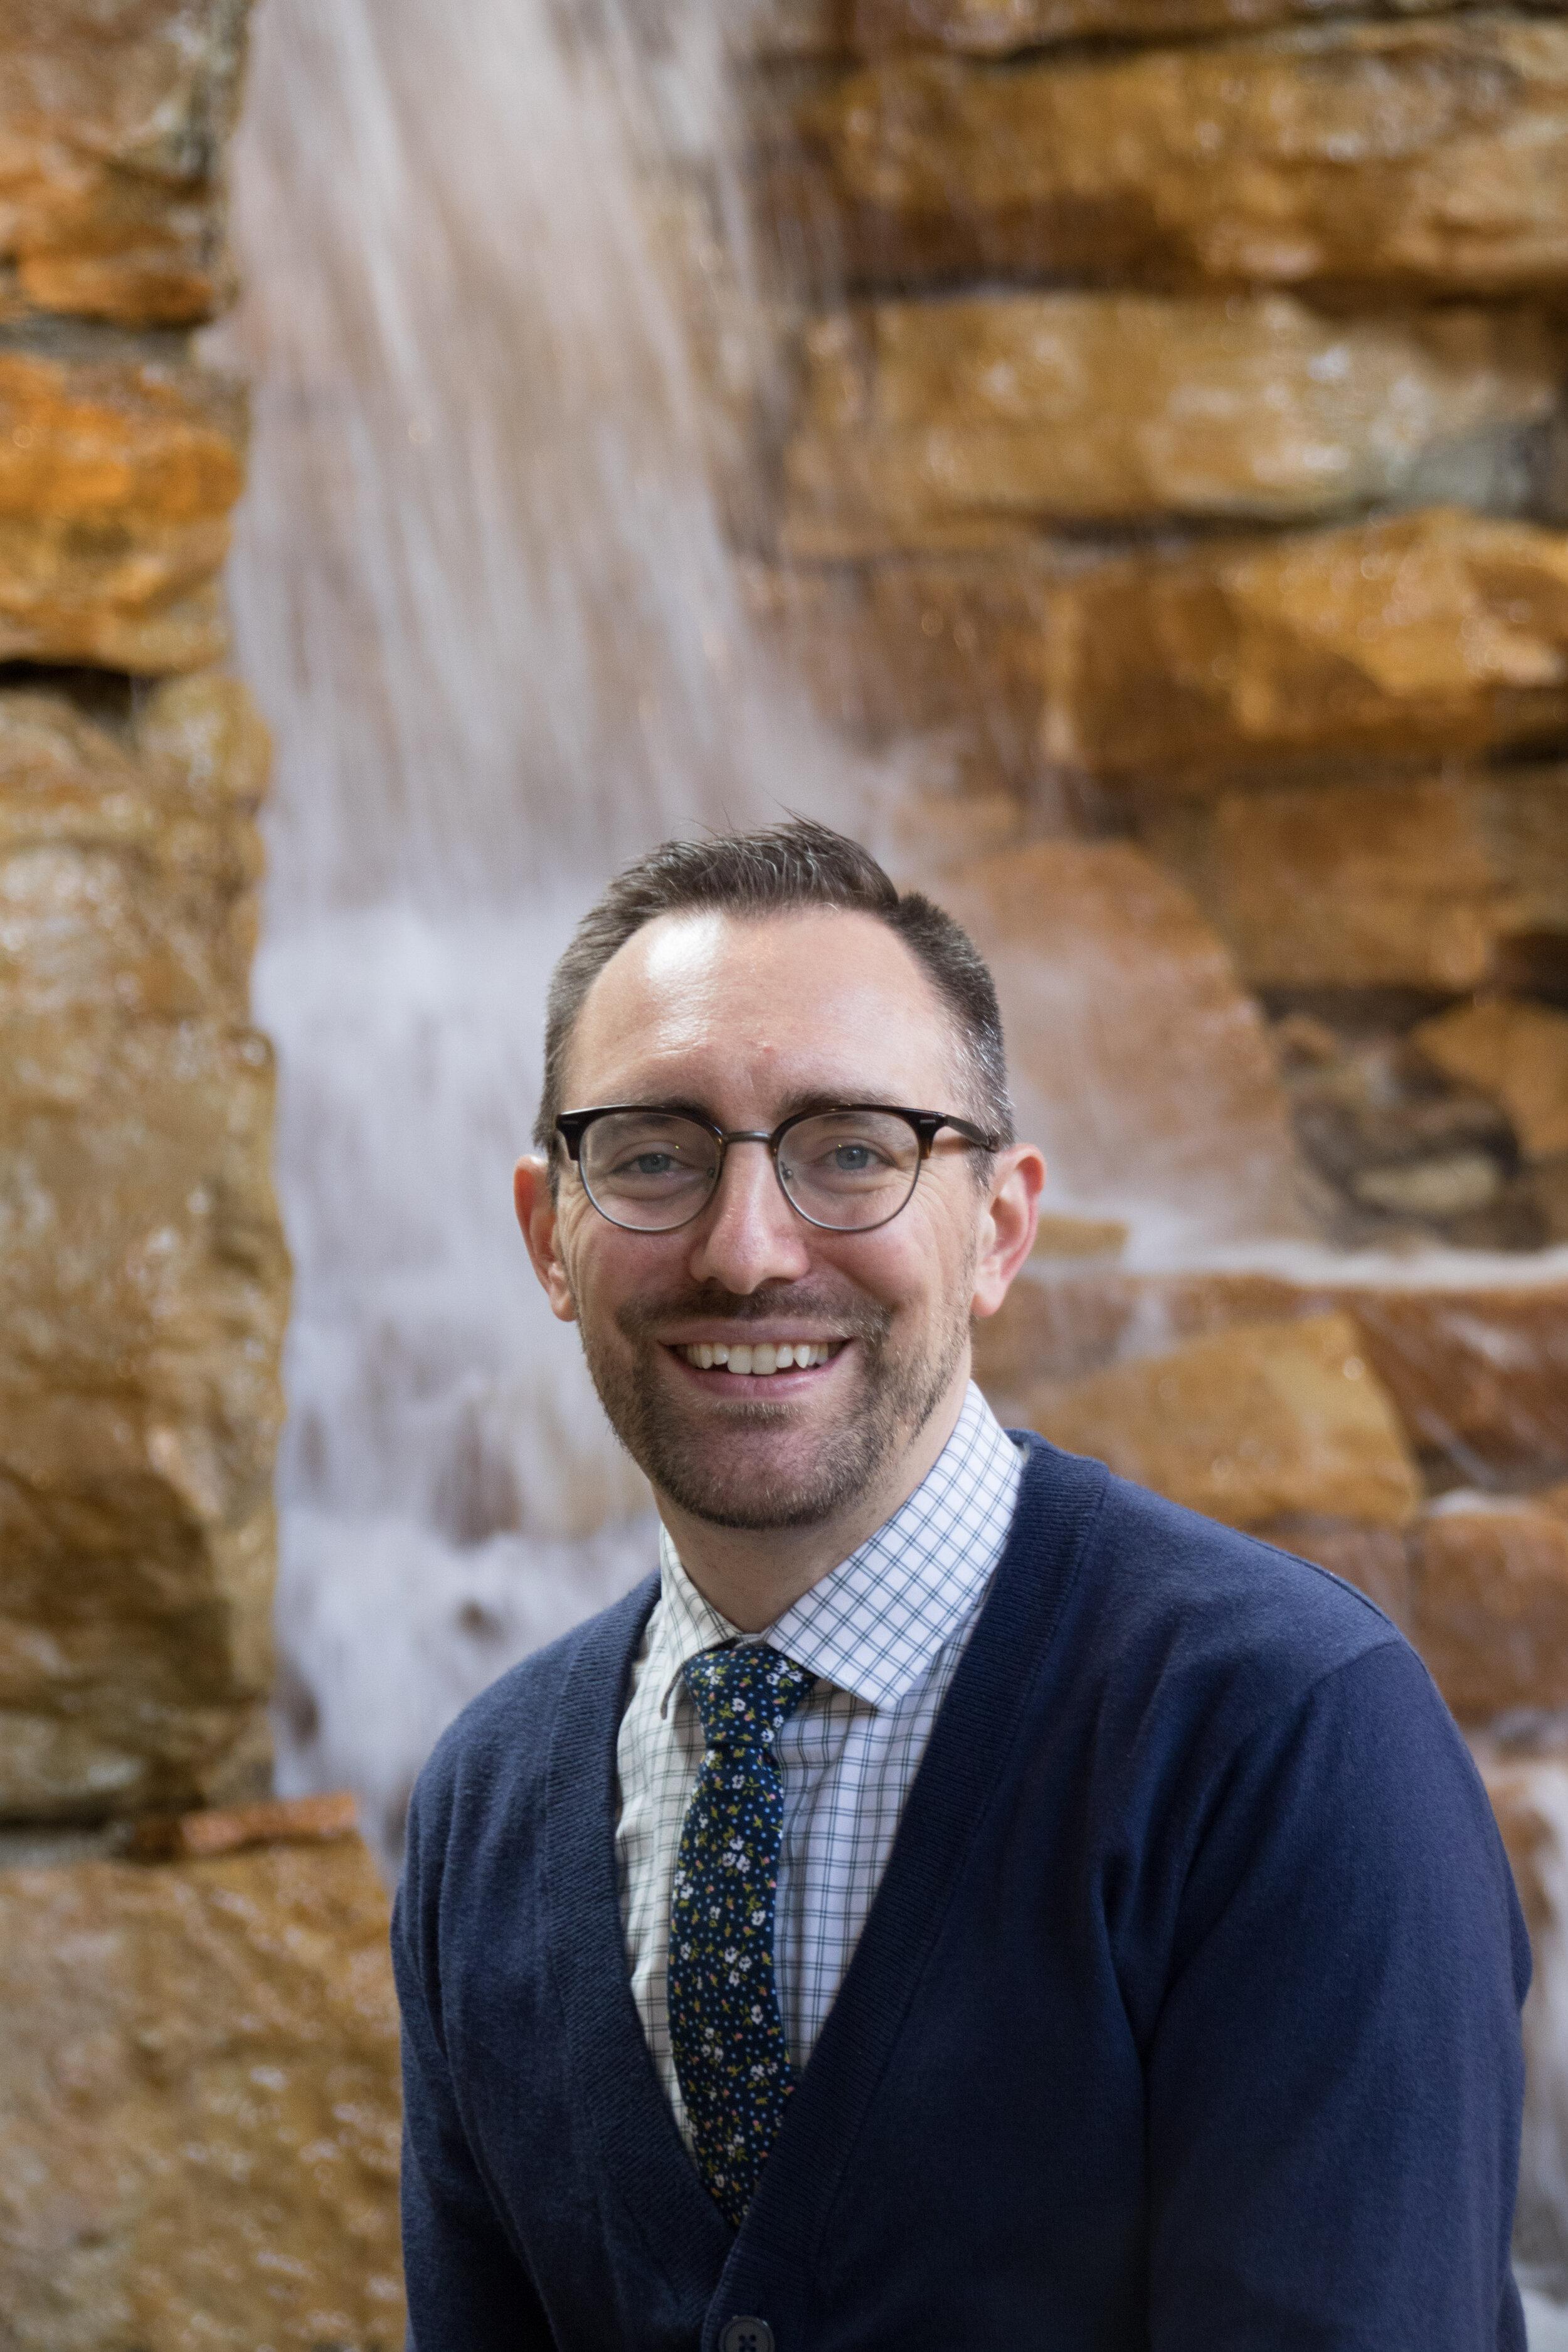 Rev. Michael Gehrling - Northeast and Assessments Associate